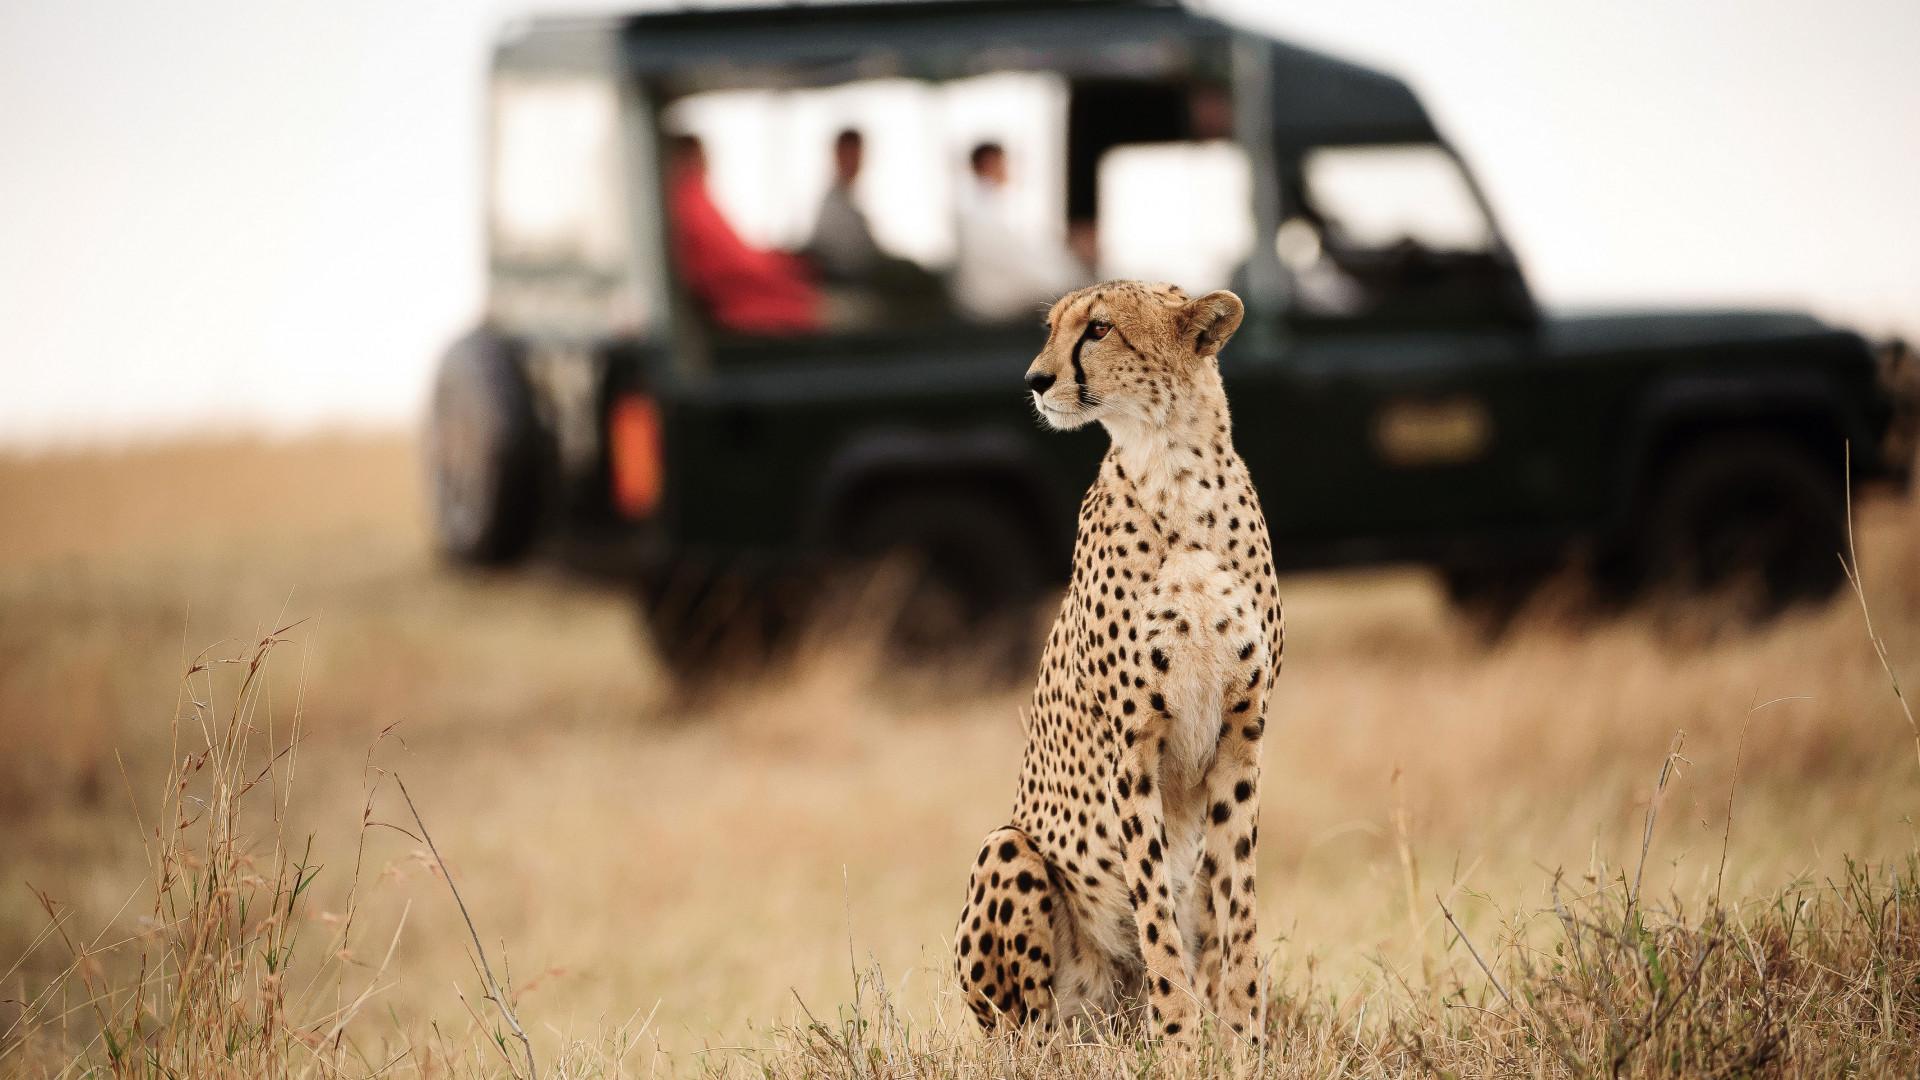 Leopard on safari in Kenya